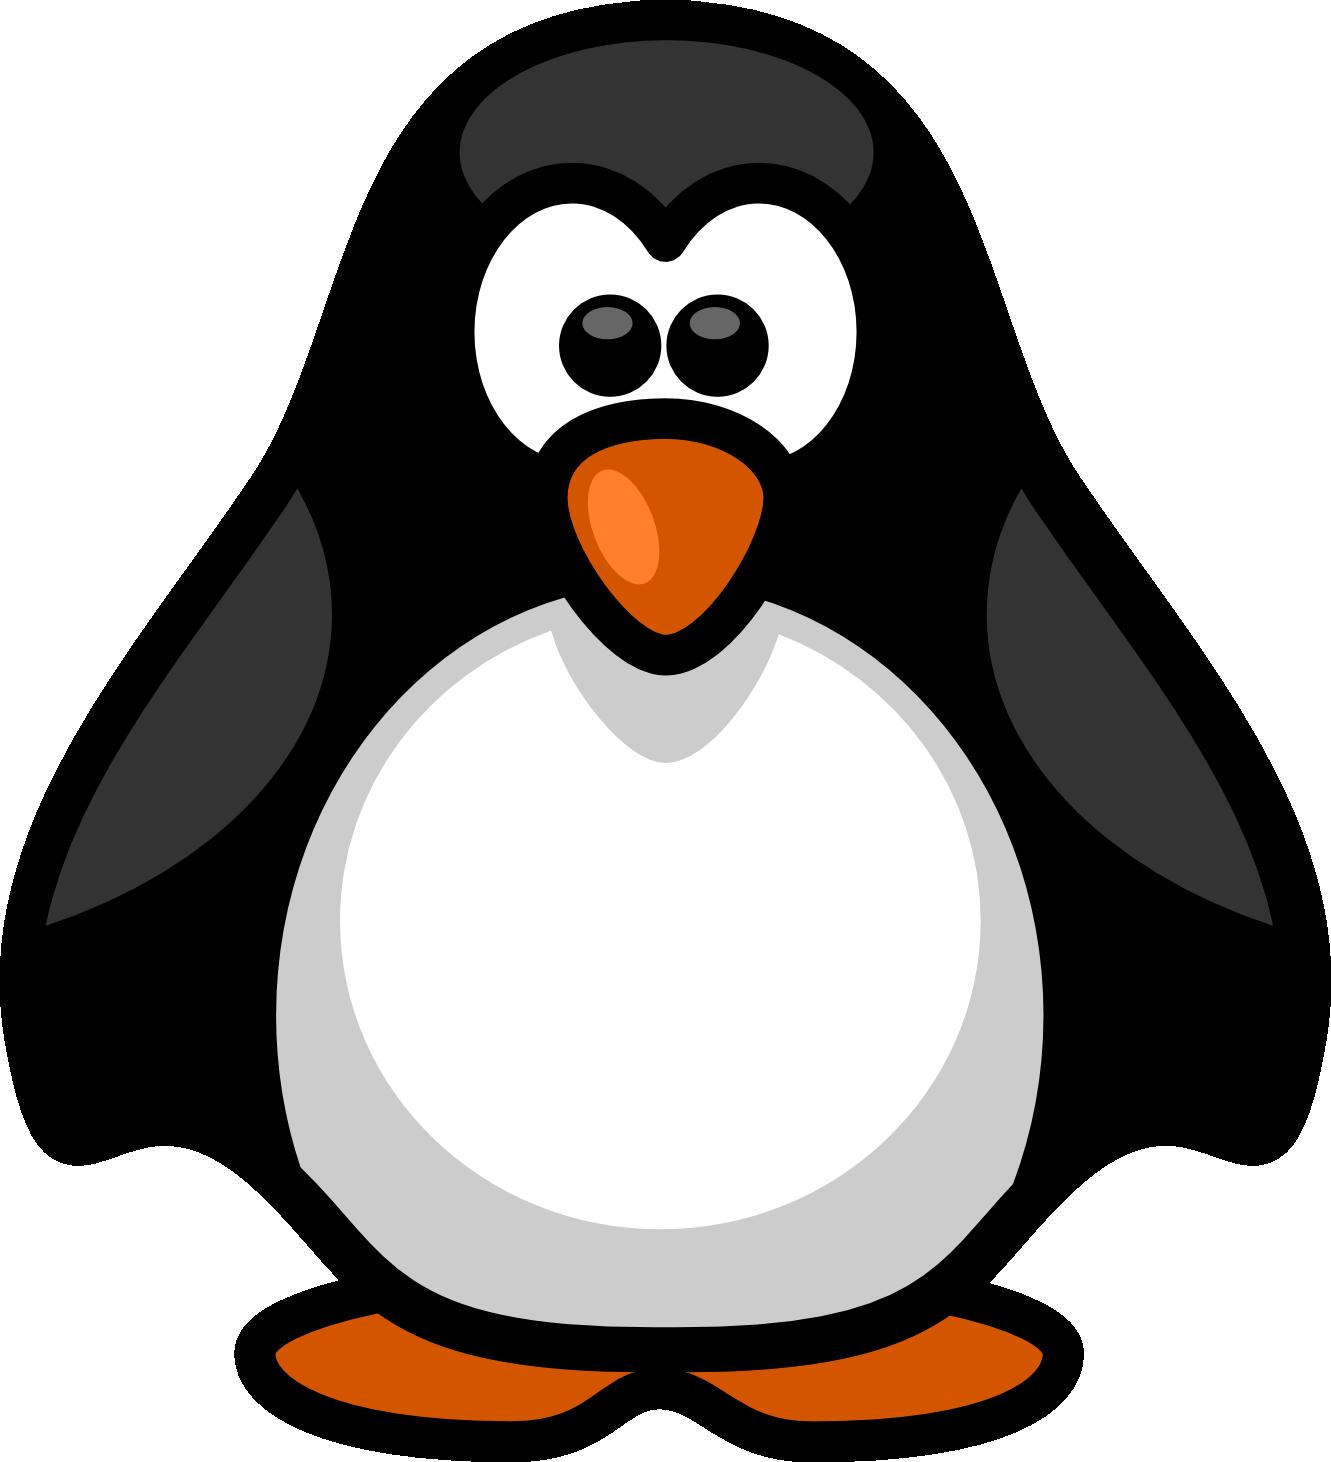 Penguin clipart child. Sliding panda free images